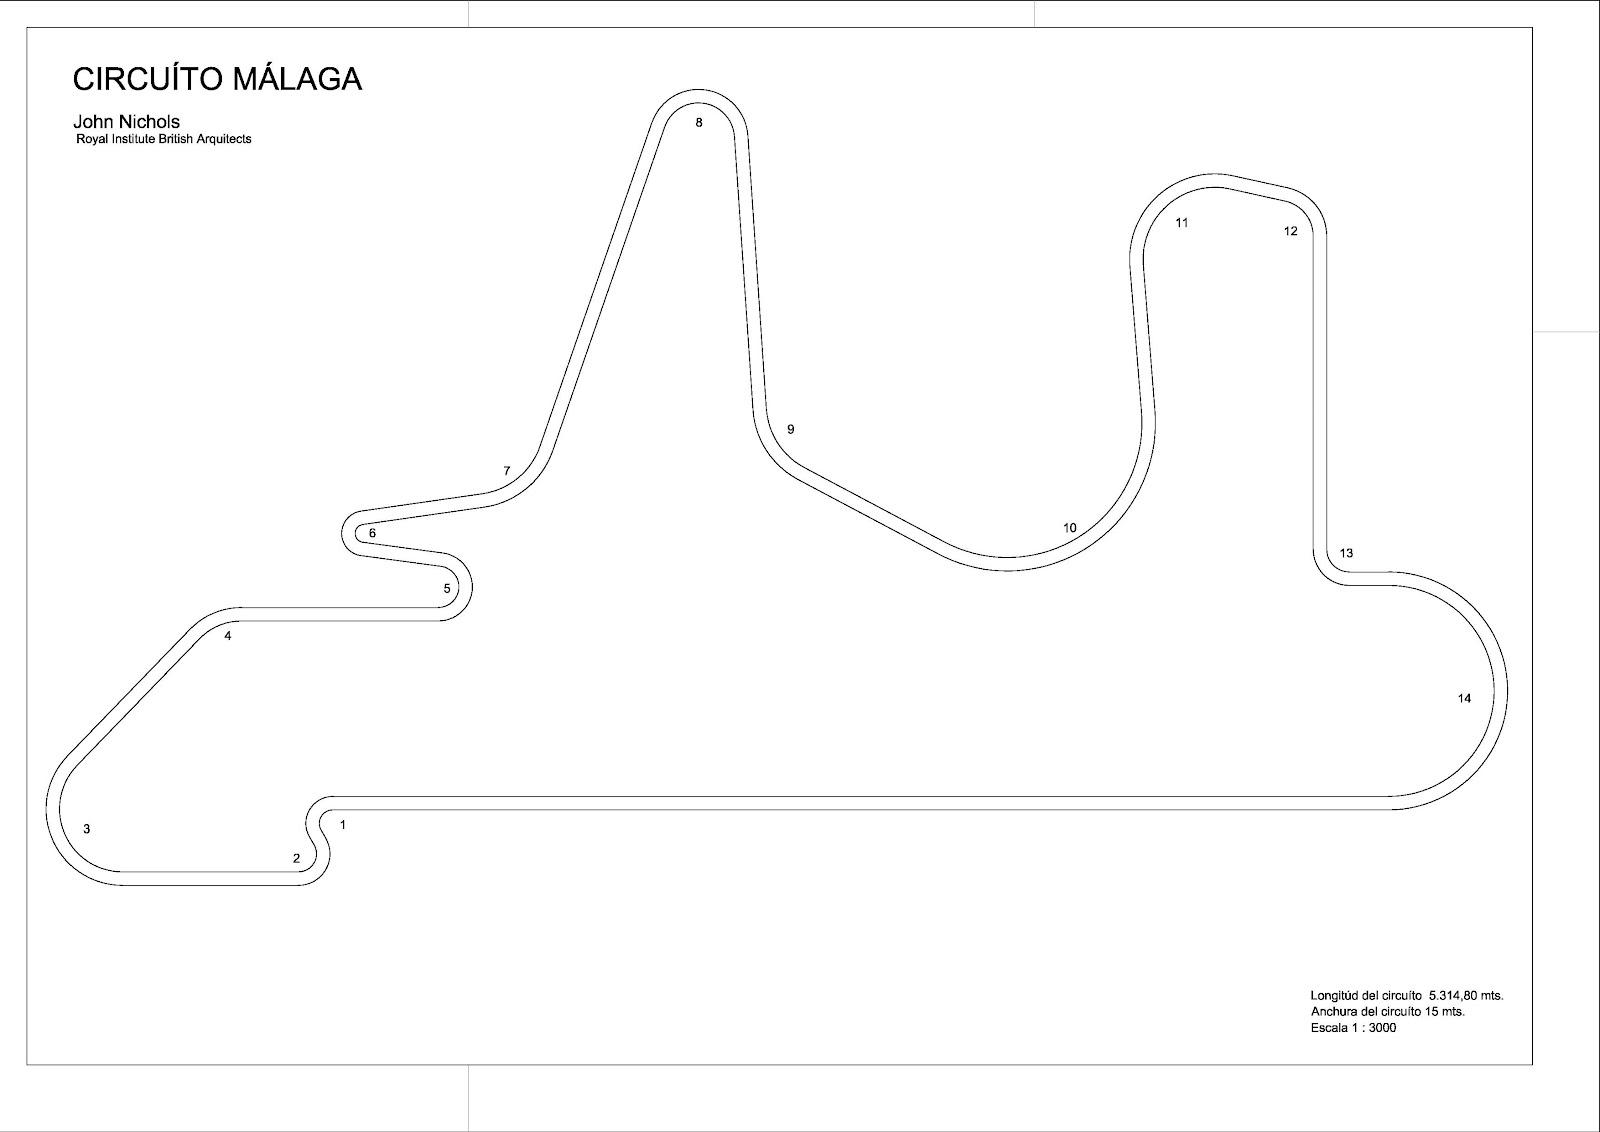 Circuito And : New race circuit circuito málaga